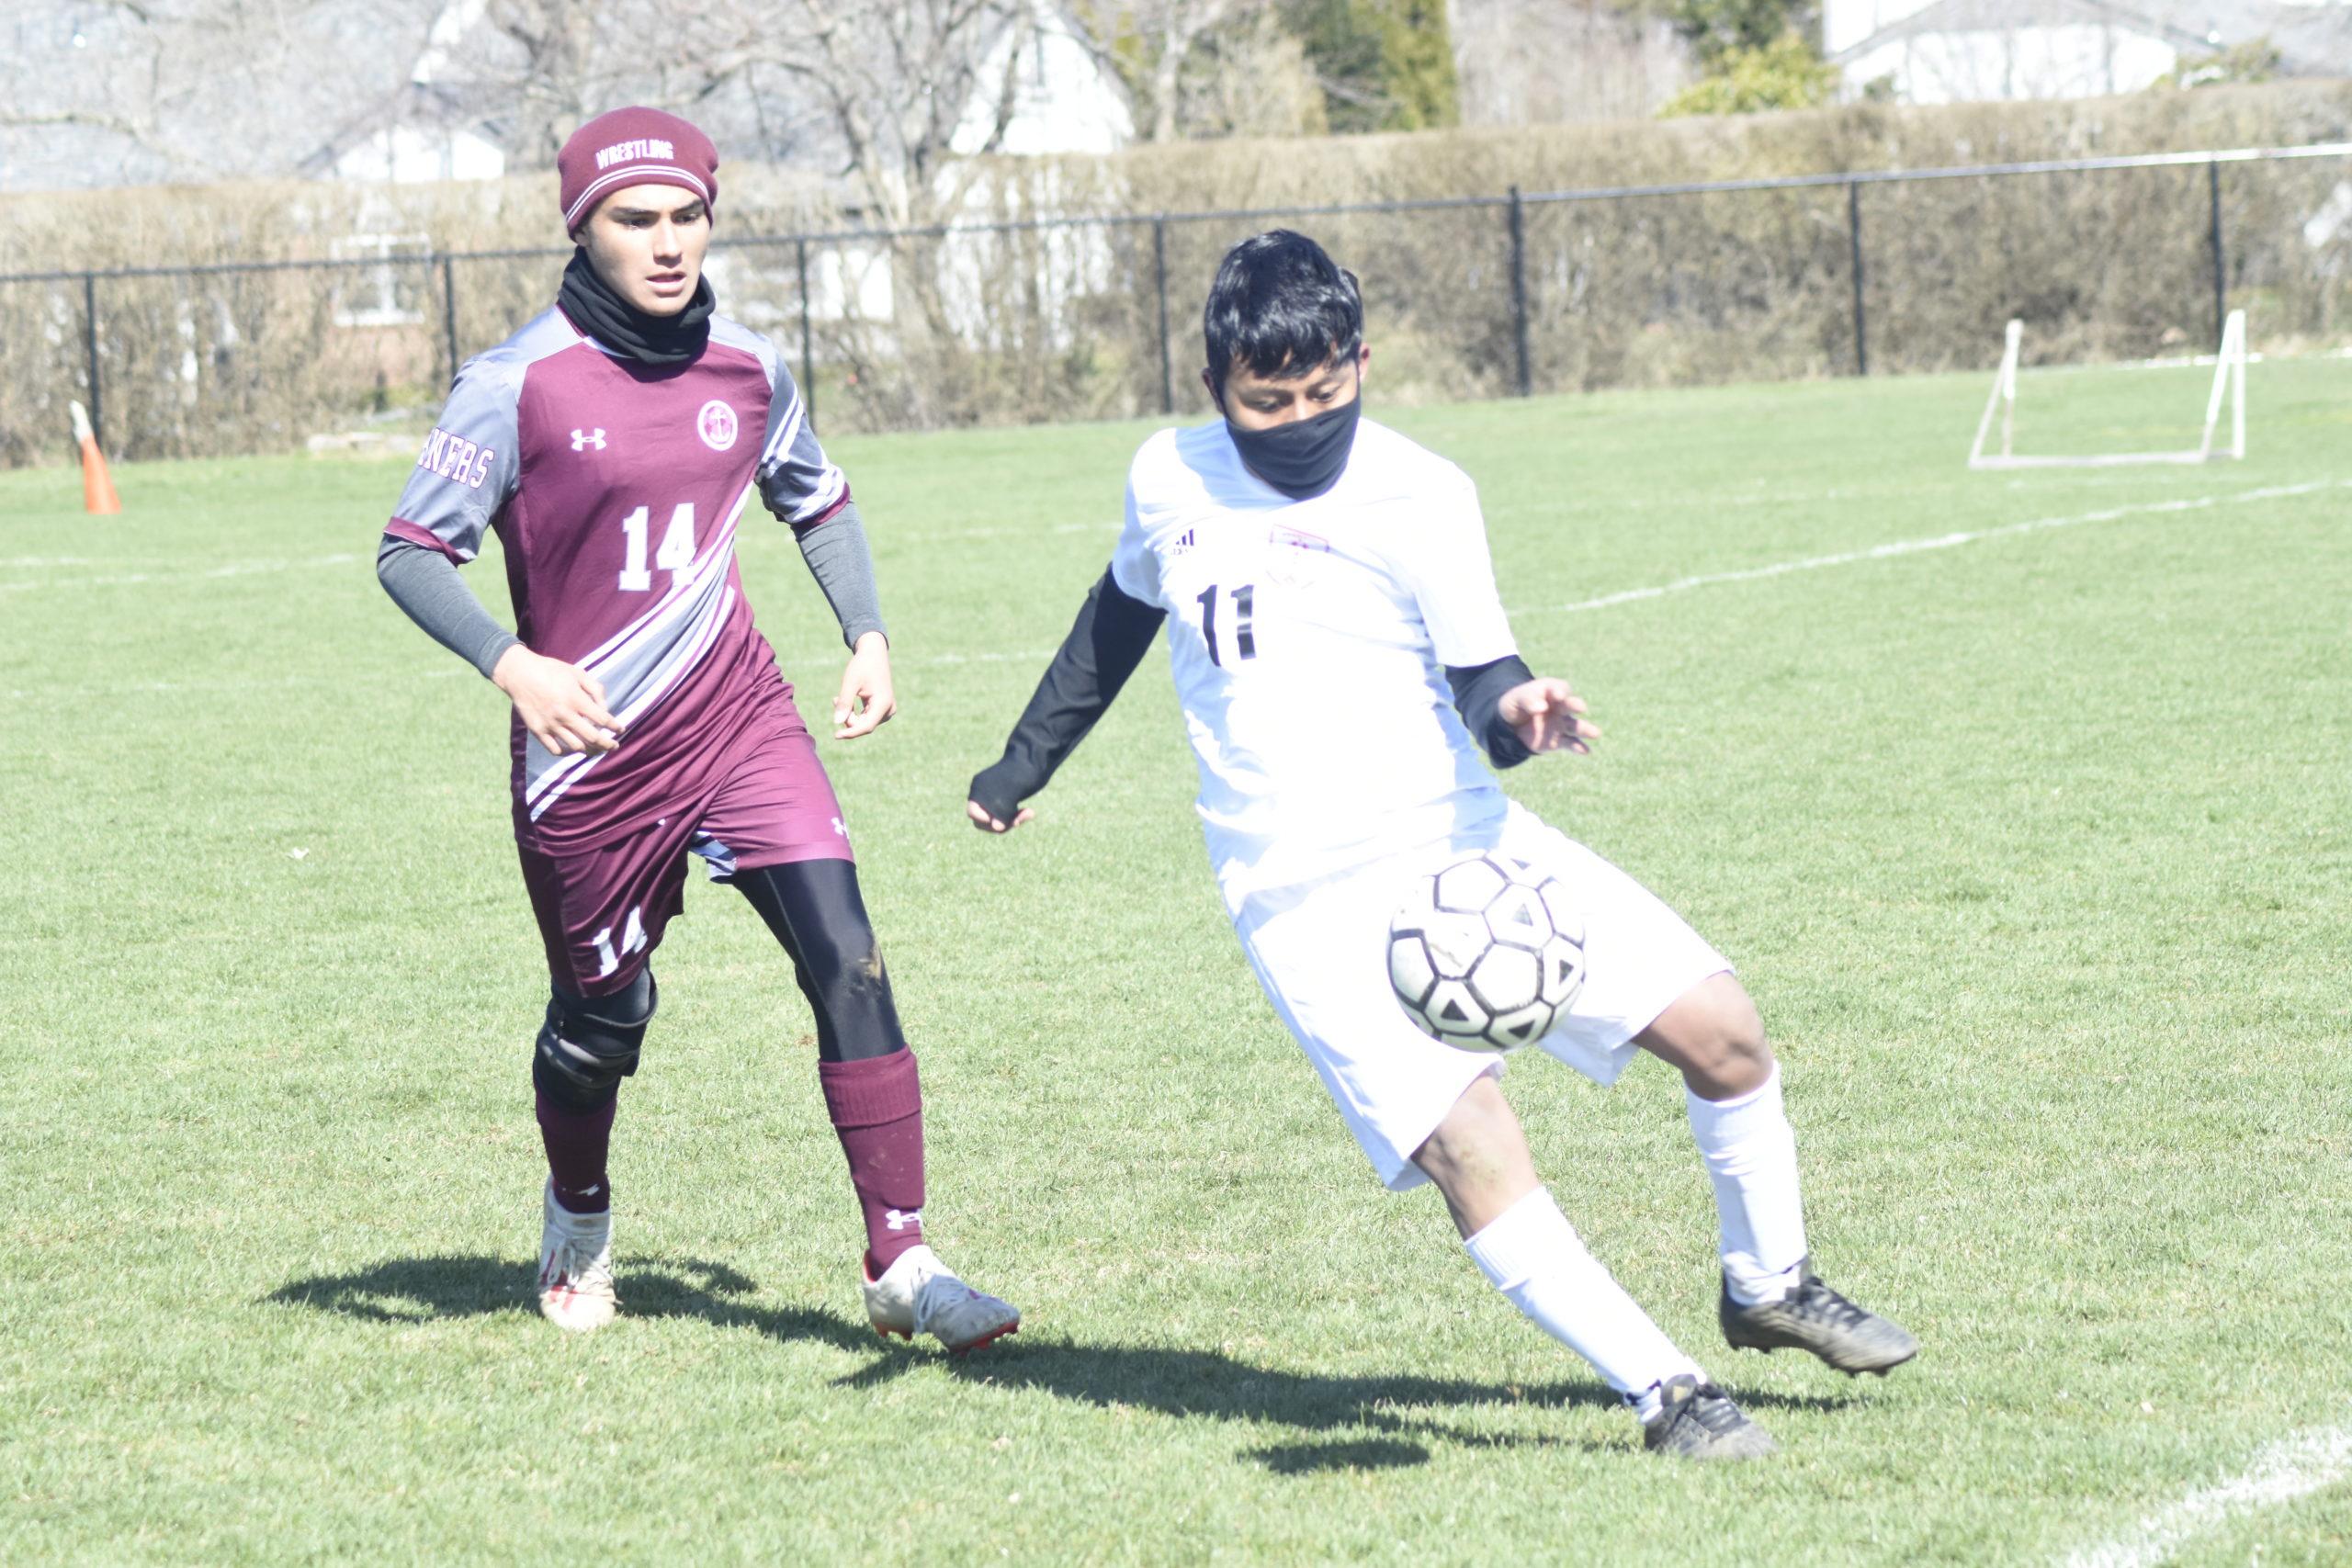 Bridgehampton junior Victor Paredes plays the ball near the sideline with Southampton junior Adrian Gonzalez trailing him.